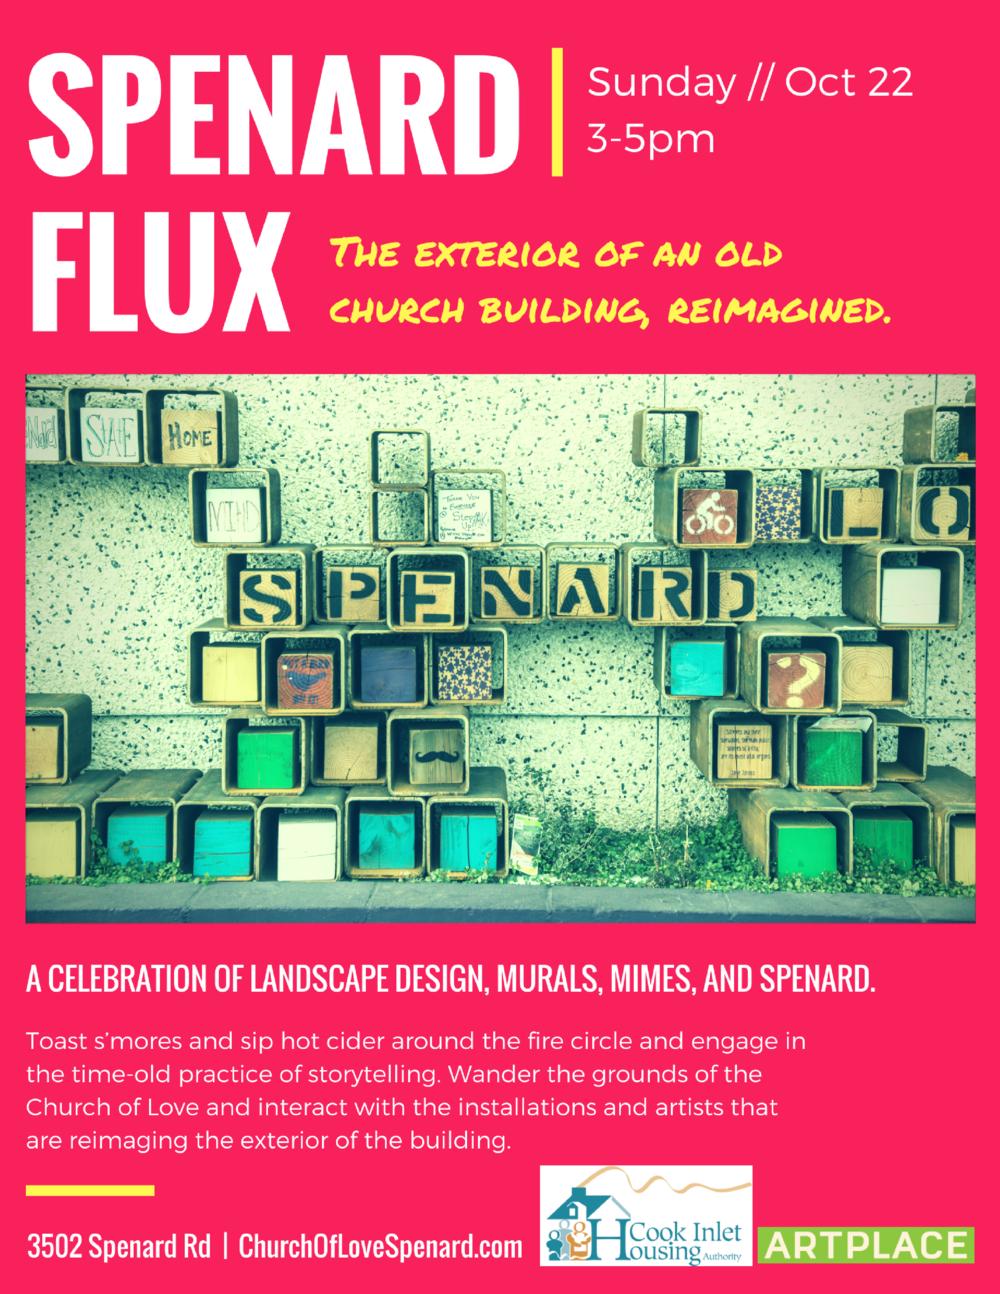 Spenard Flux